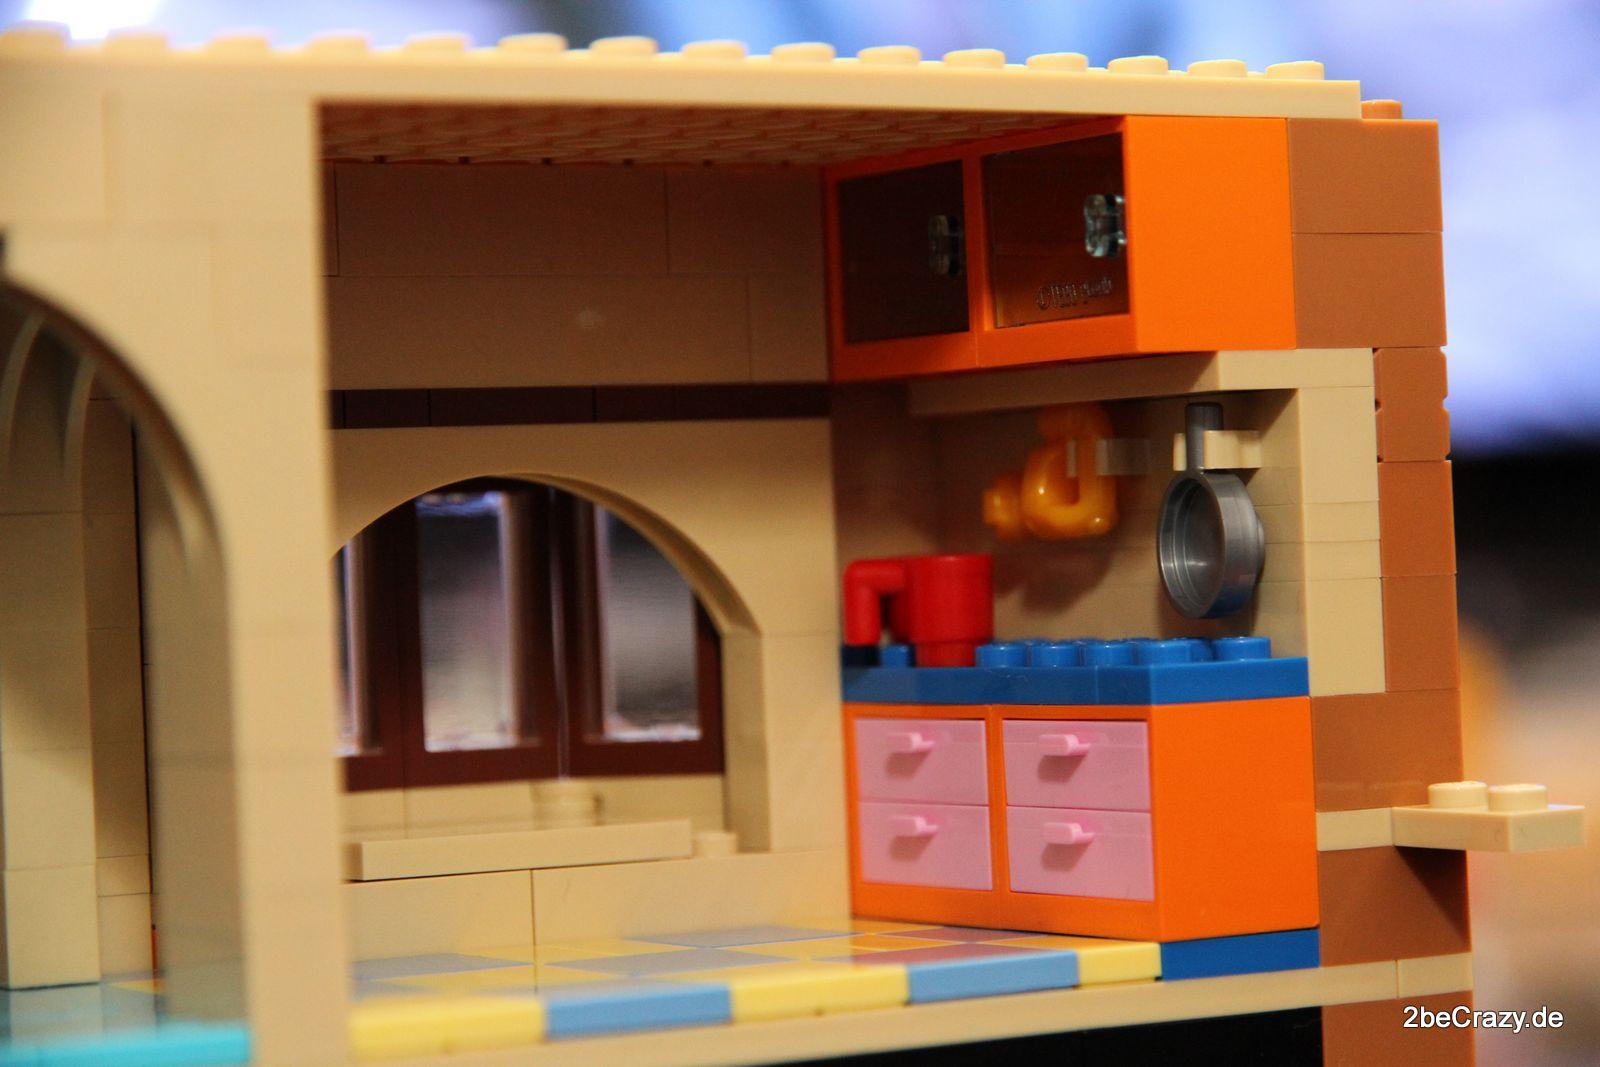 simpsons haus lego 11 2becrazy. Black Bedroom Furniture Sets. Home Design Ideas